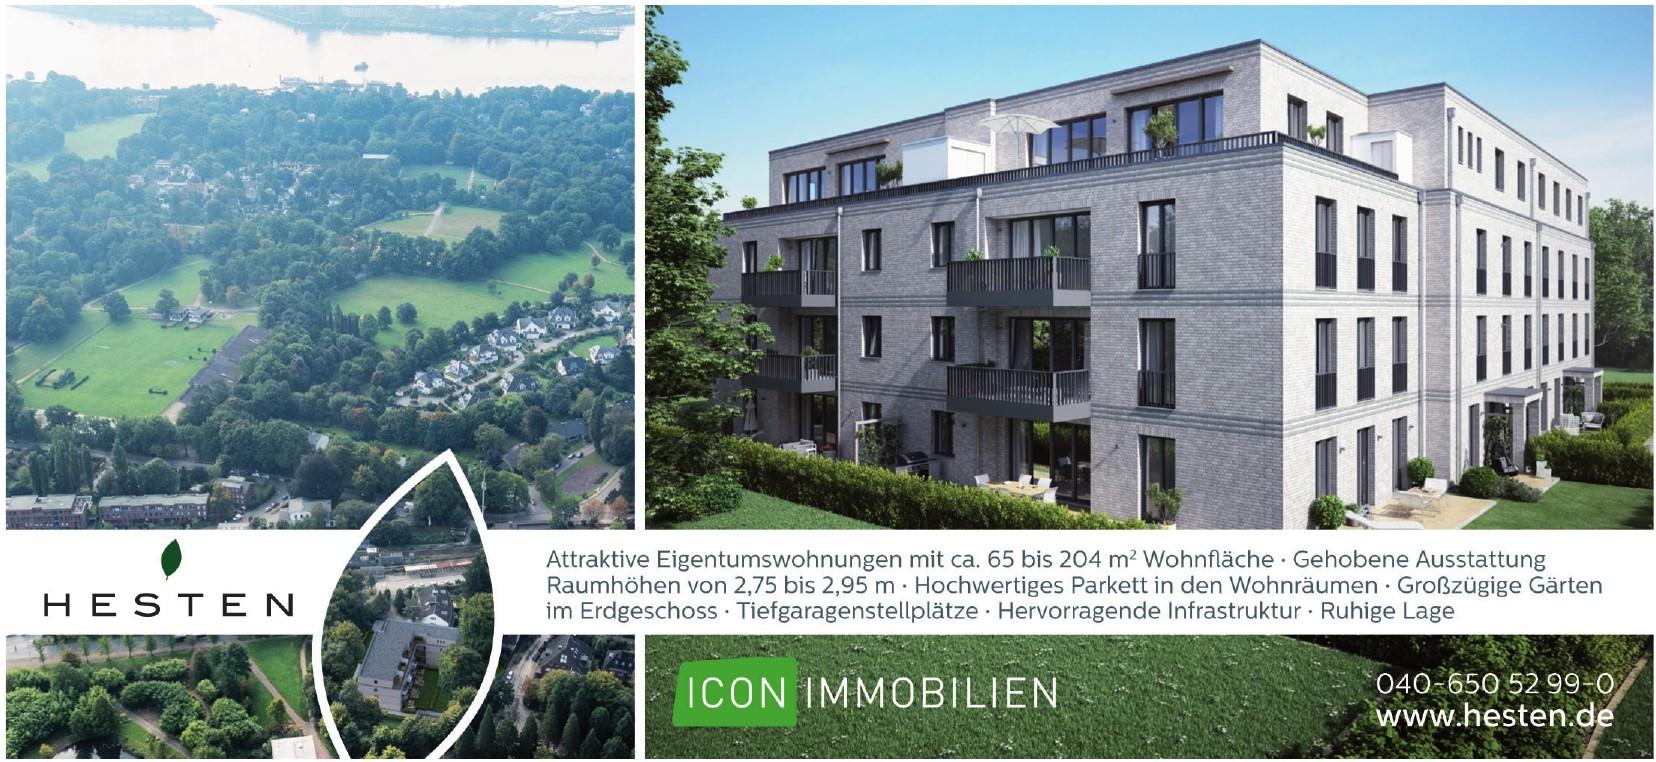 Hesten - Icon Immobilien